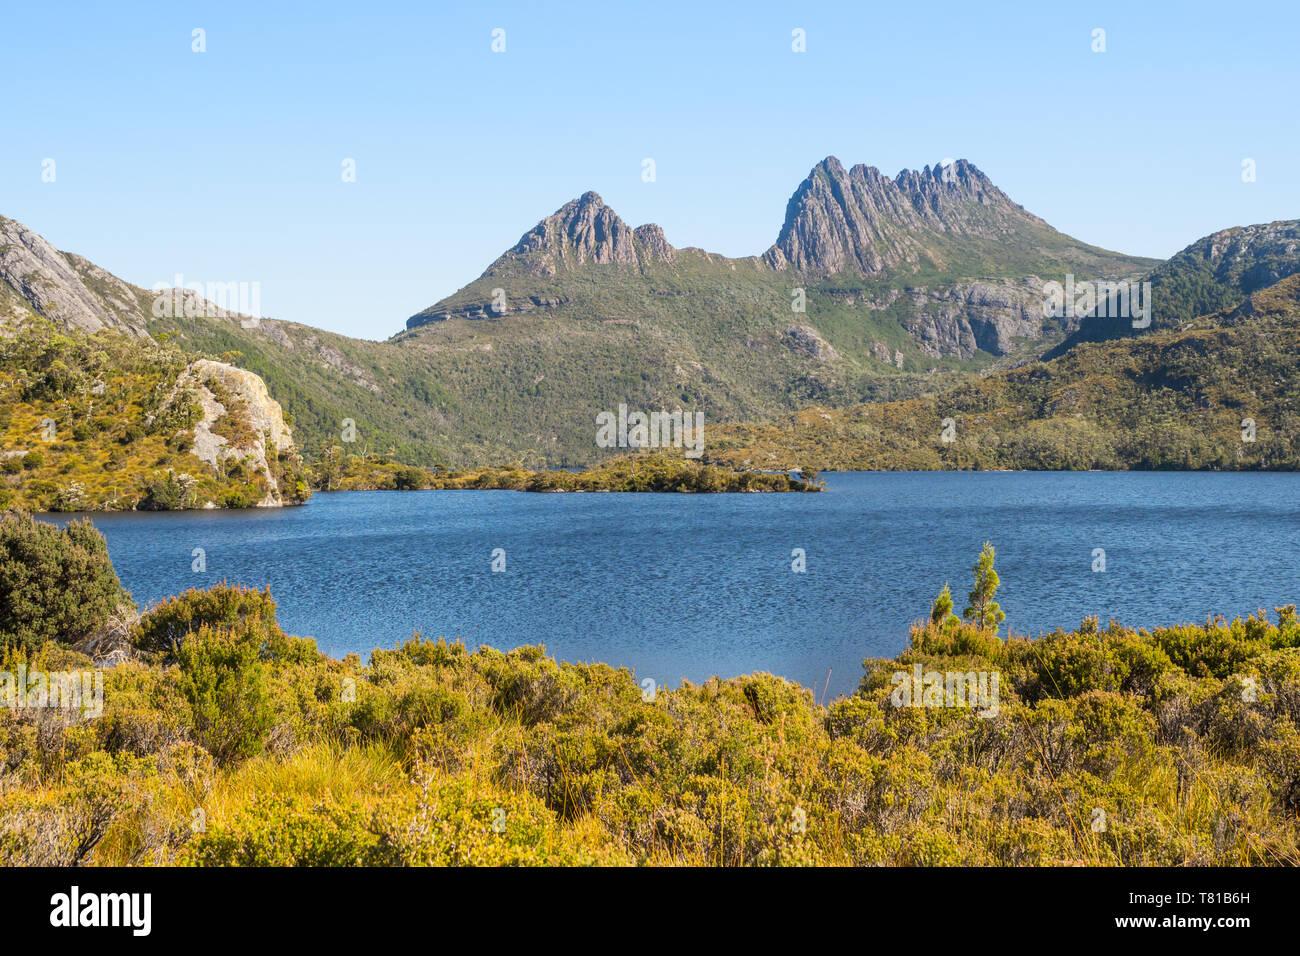 Cradle Mountain and Dove Lake in the Cradle Mountain - Lake St Clair National Park in Tasmania, Australia. Stock Photo